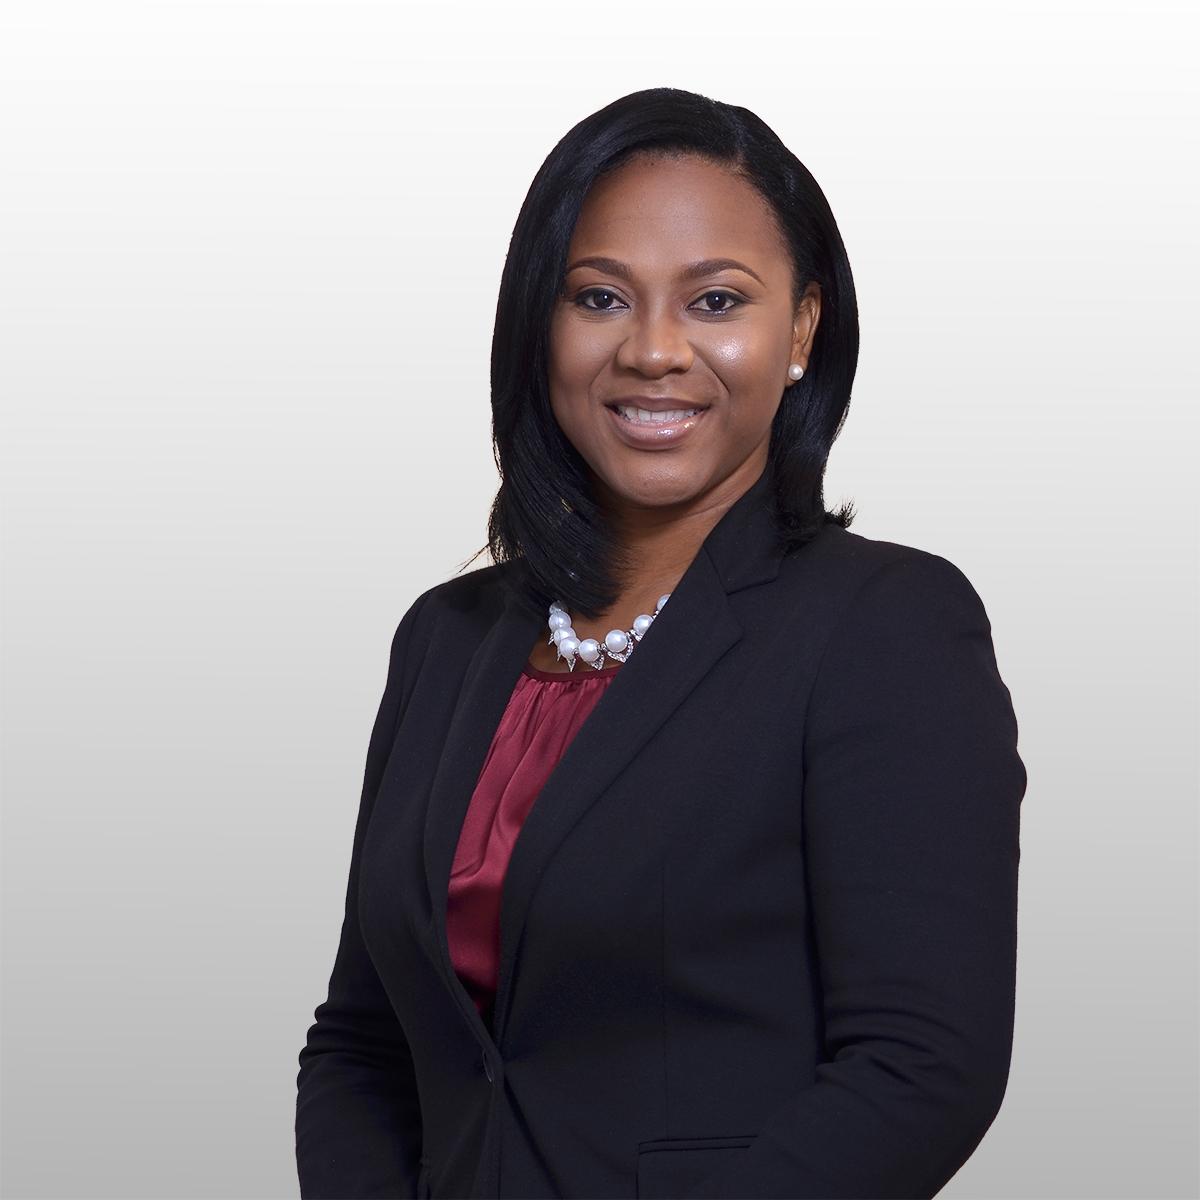 Peta-Gay Miller - Asst. Vice President, Sales & Client Services